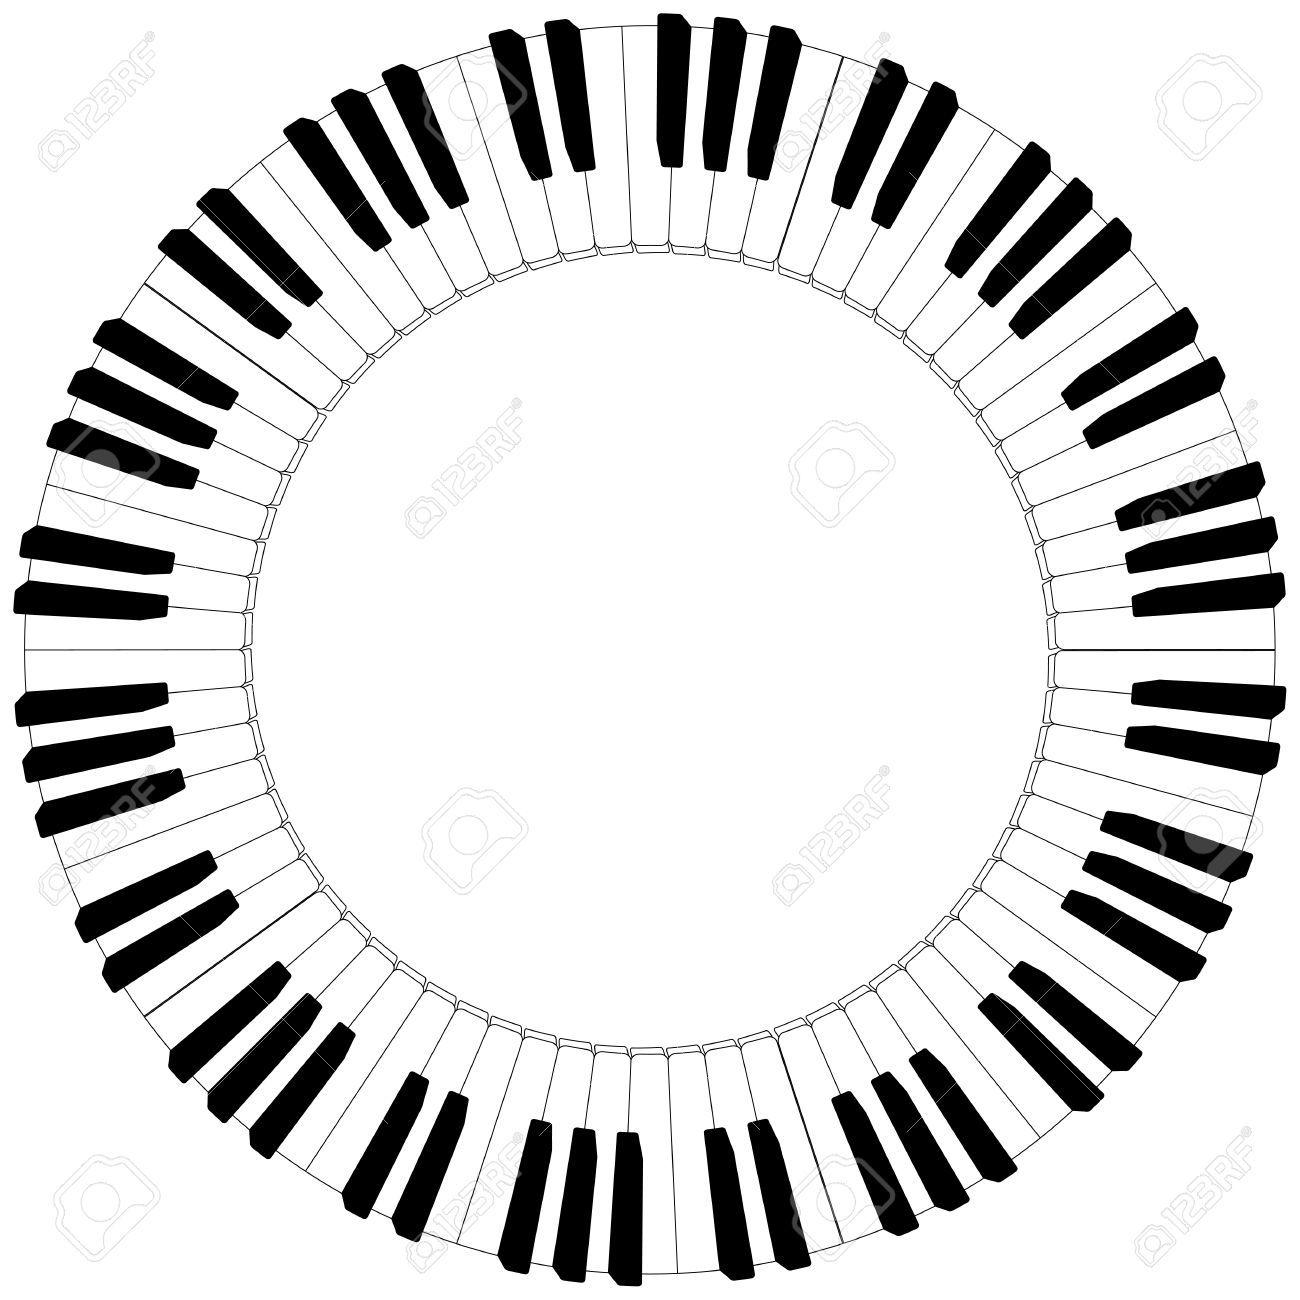 36510443 Round Piano Keyboard Frame In Black And White Stock Vector Piano Jpg 1300 1300 Disenos De Unas